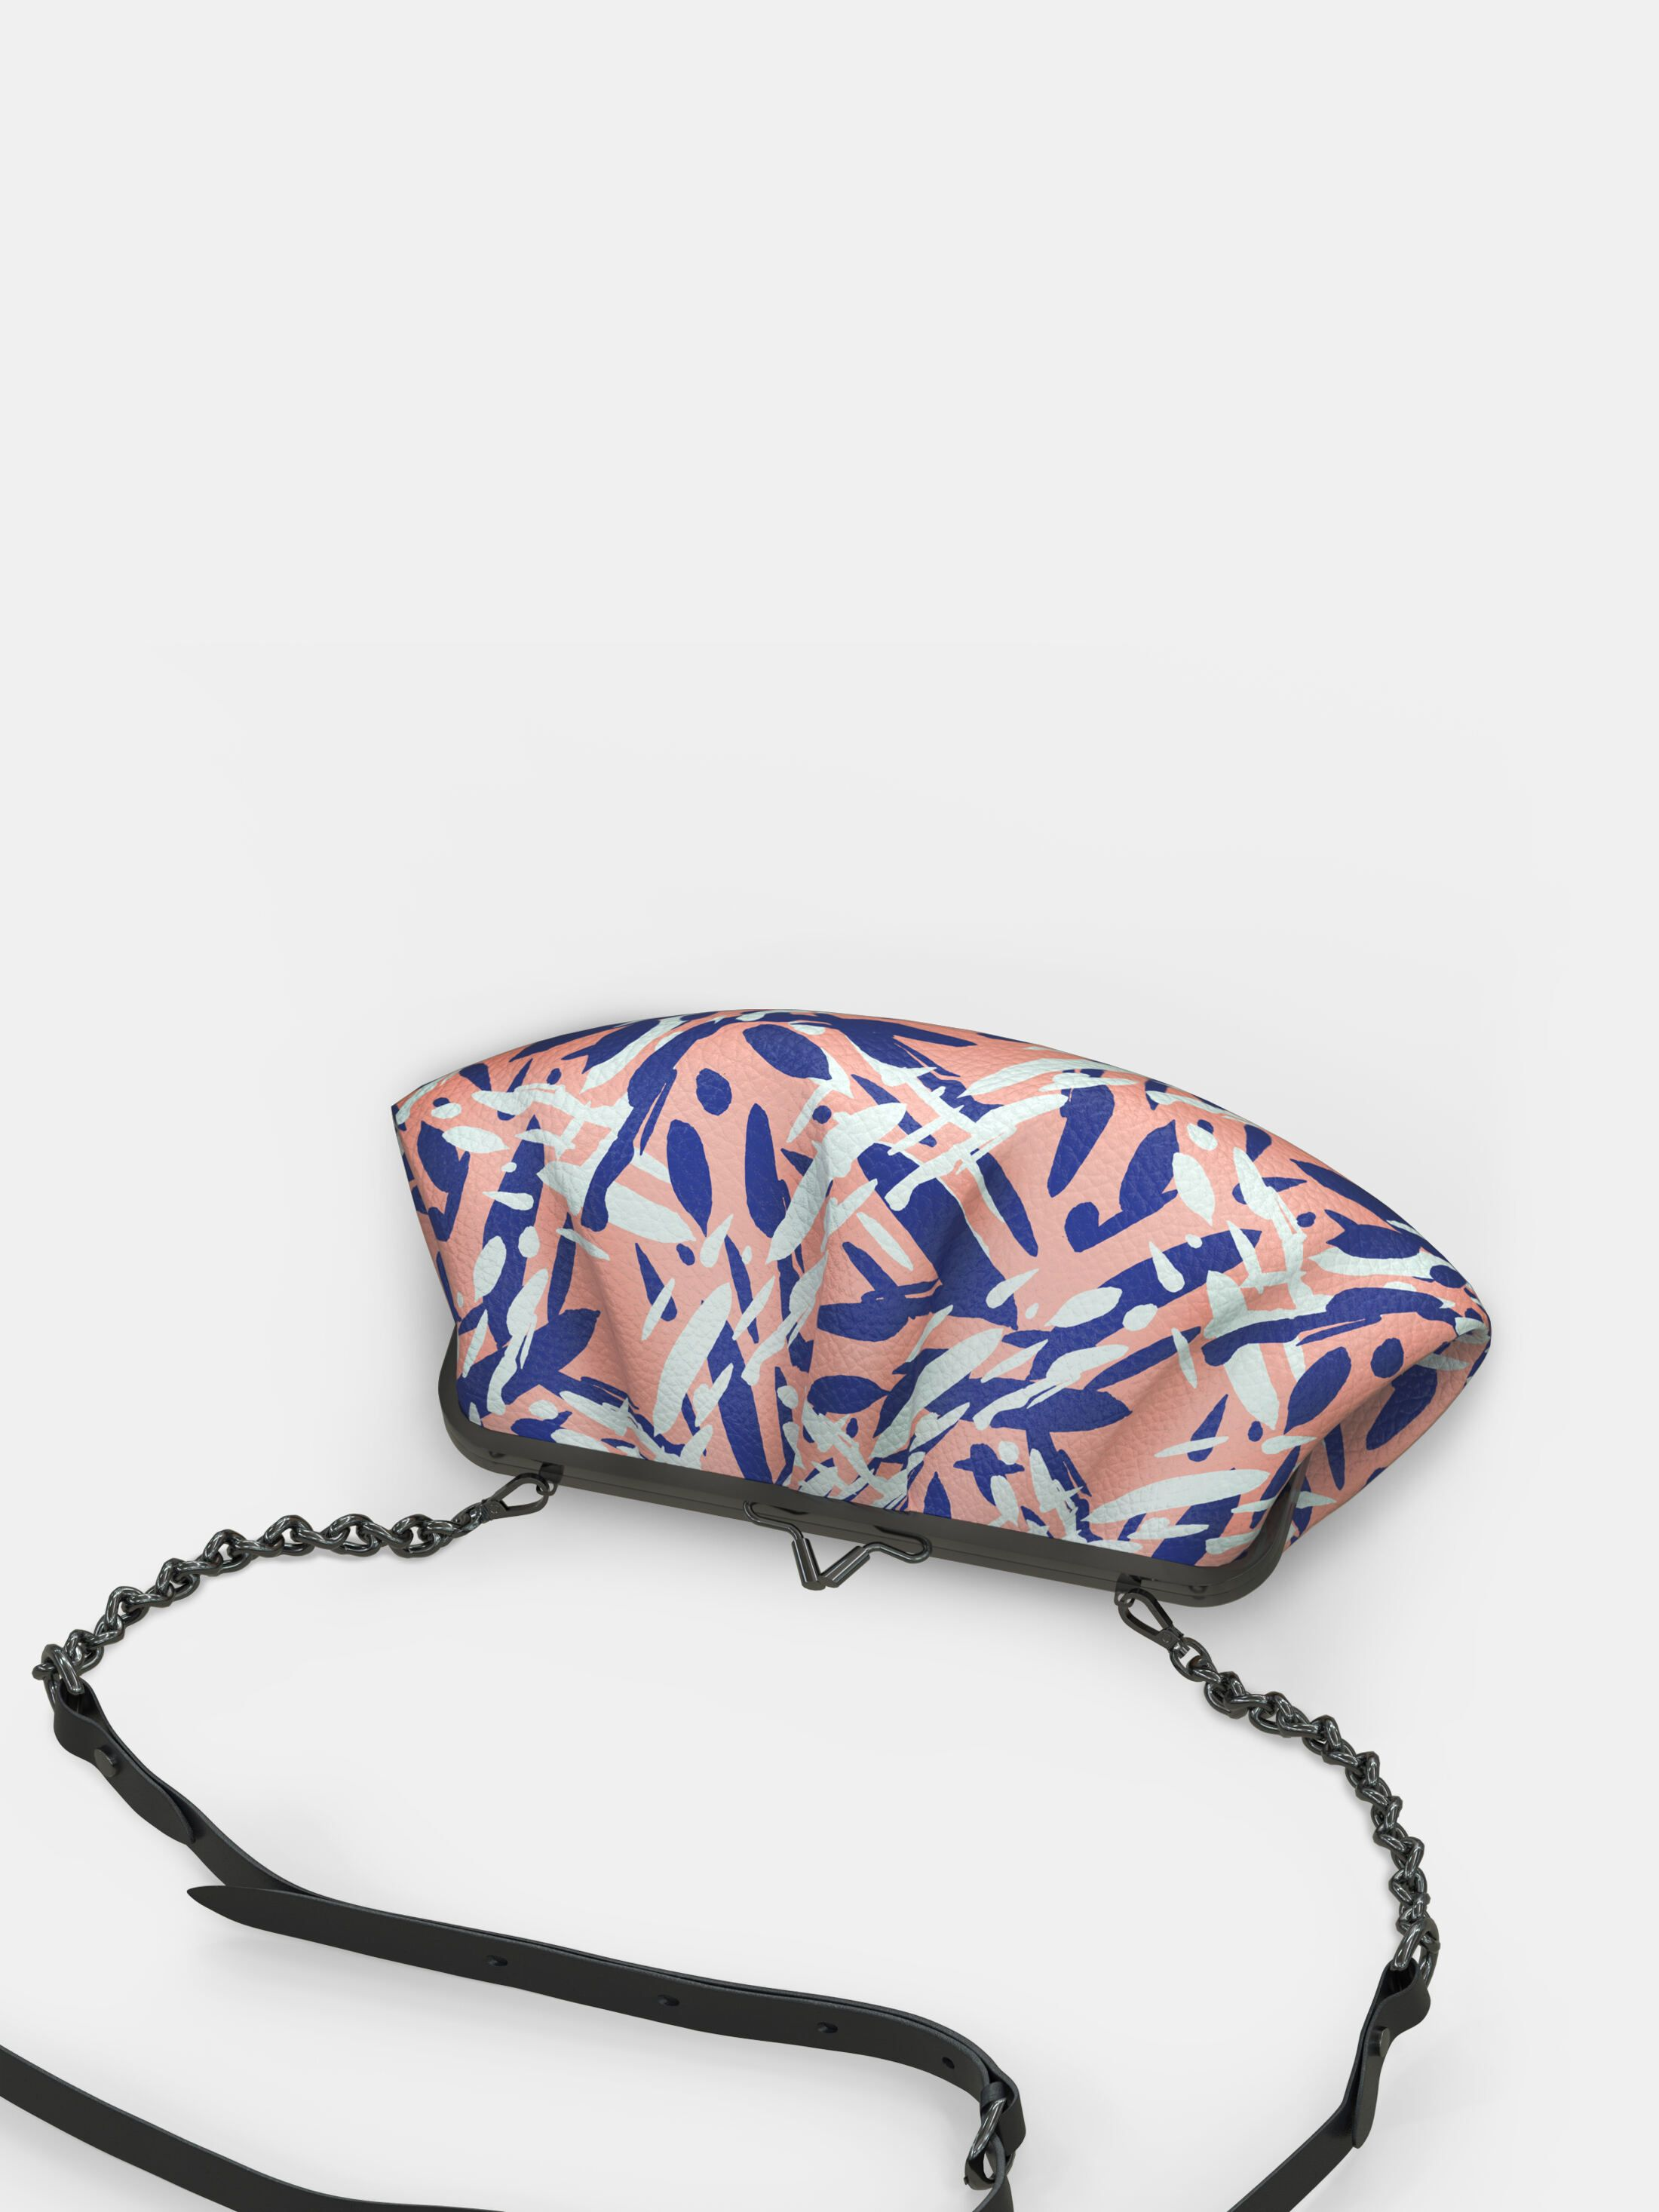 personnalisez votre sac fermoir kisslock